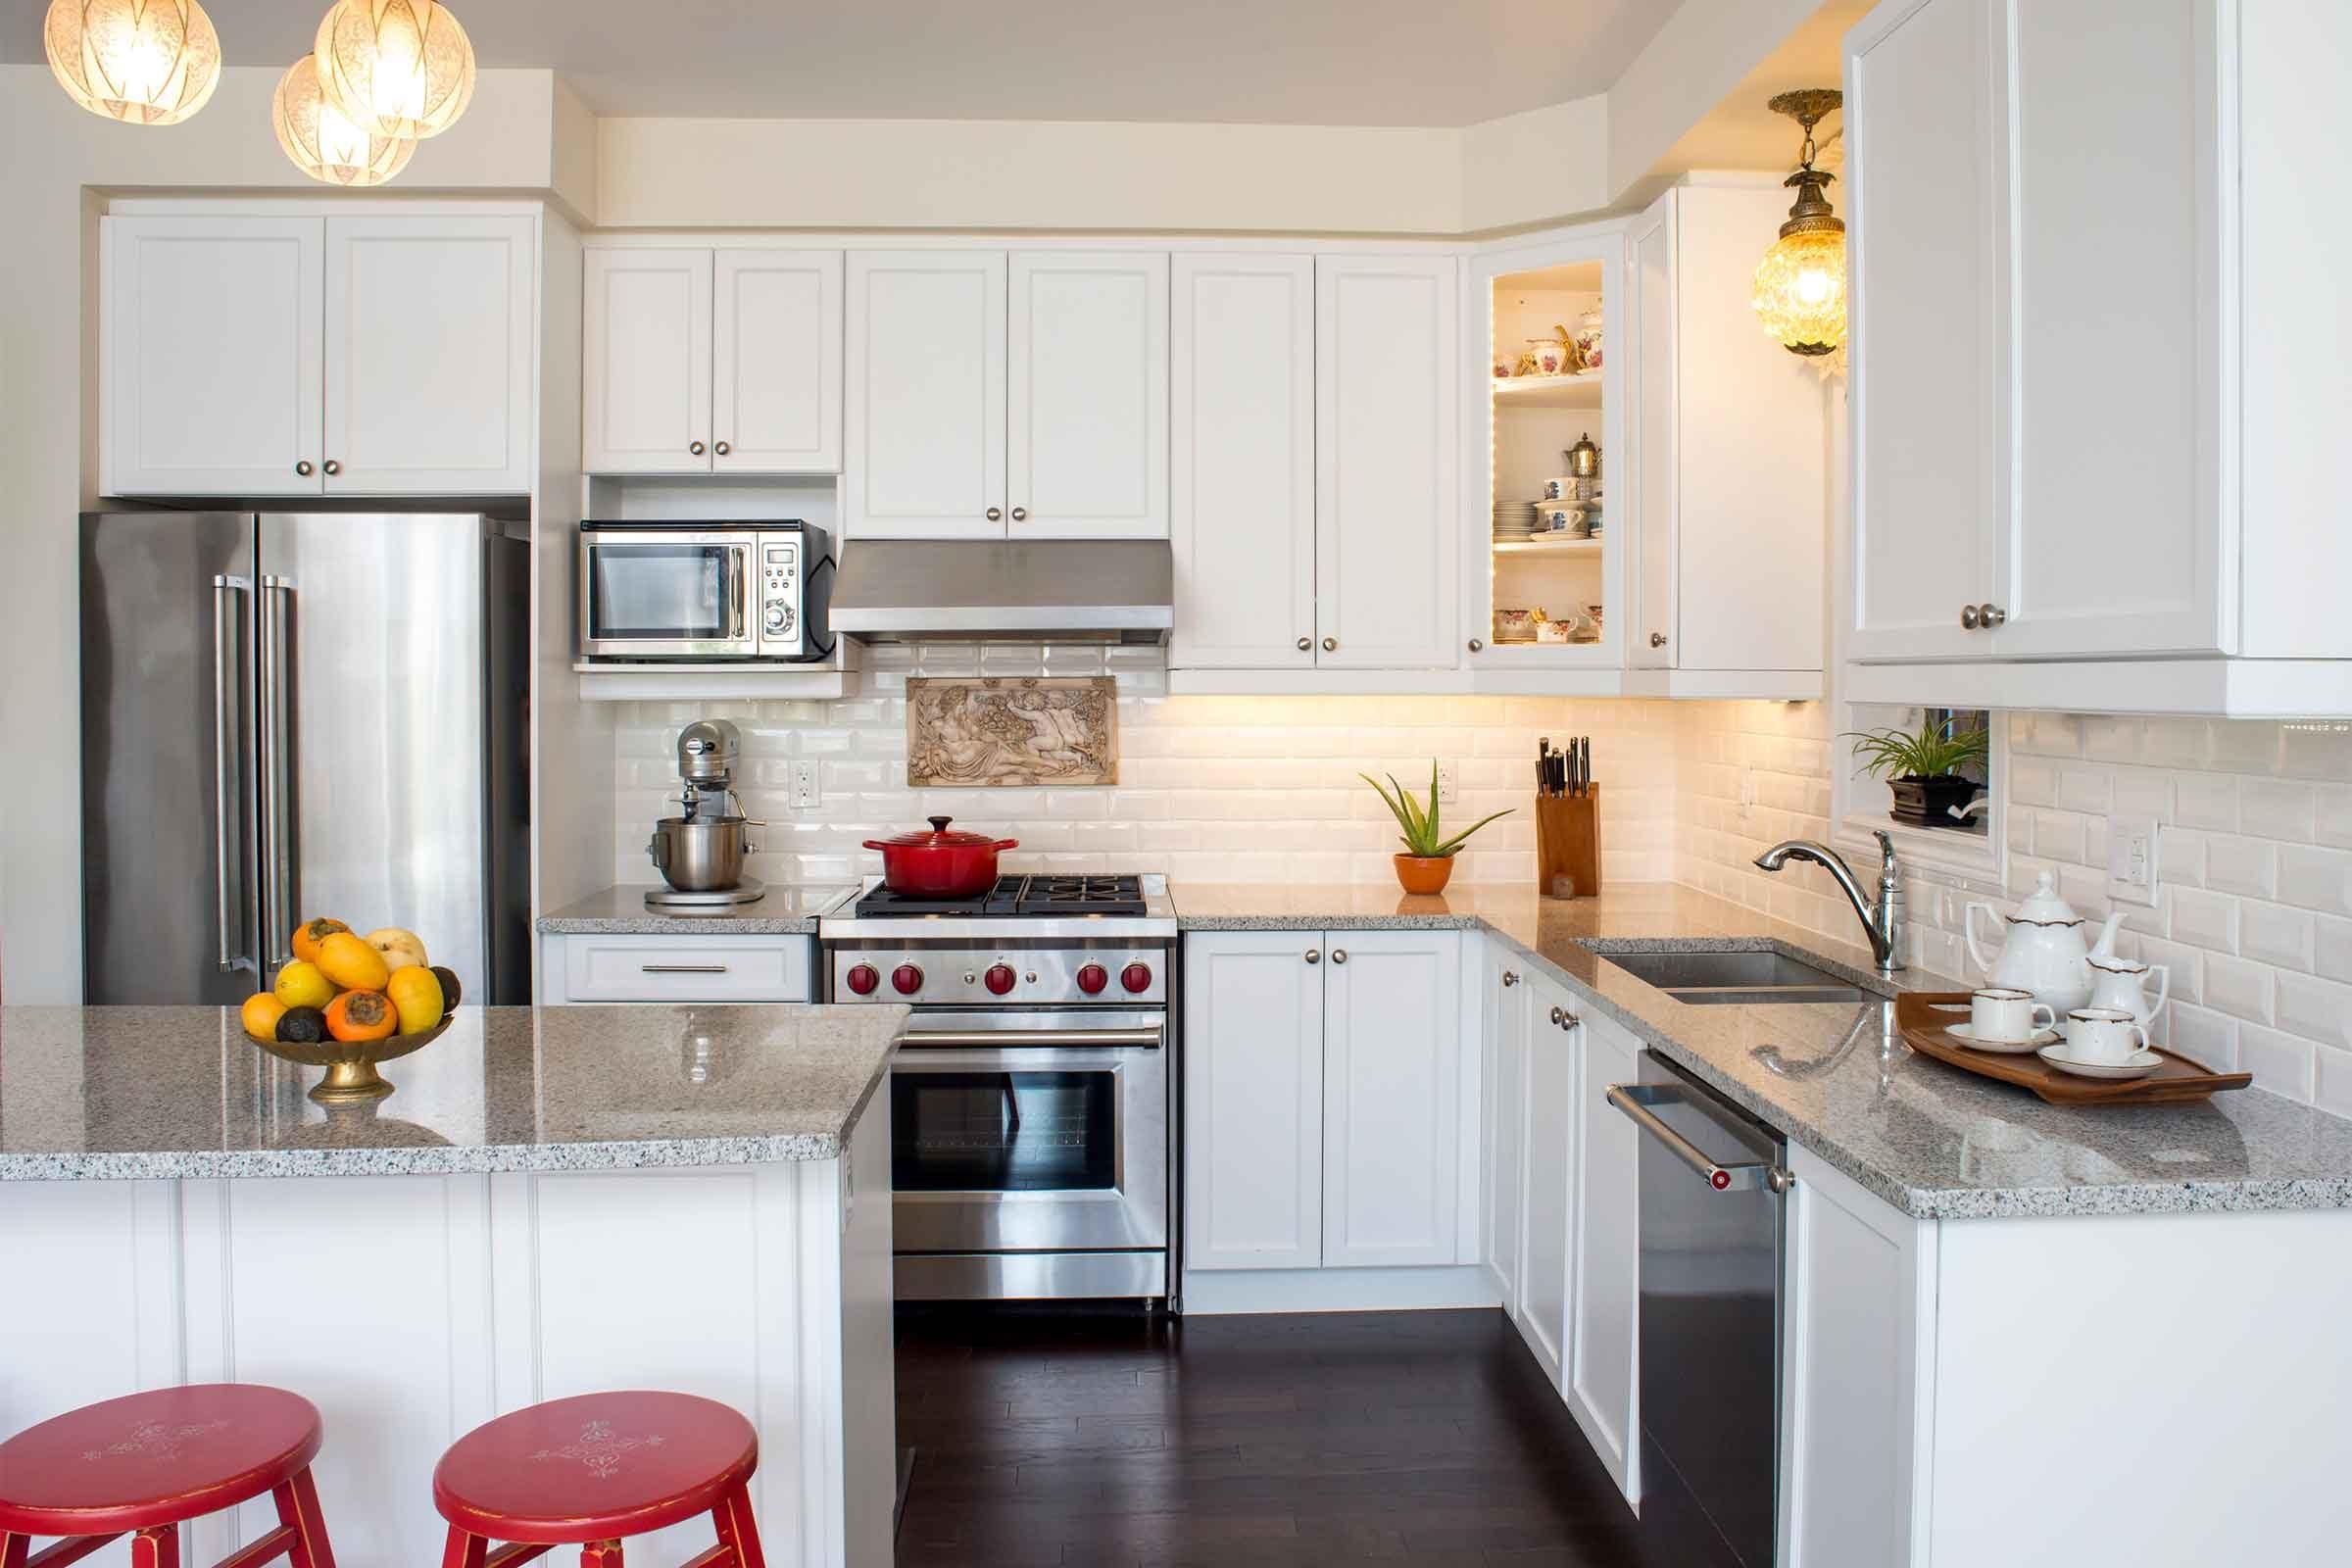 Kitchen design ideas that look expensive reader 39 s digest - Campanas de cocina rusticas ...